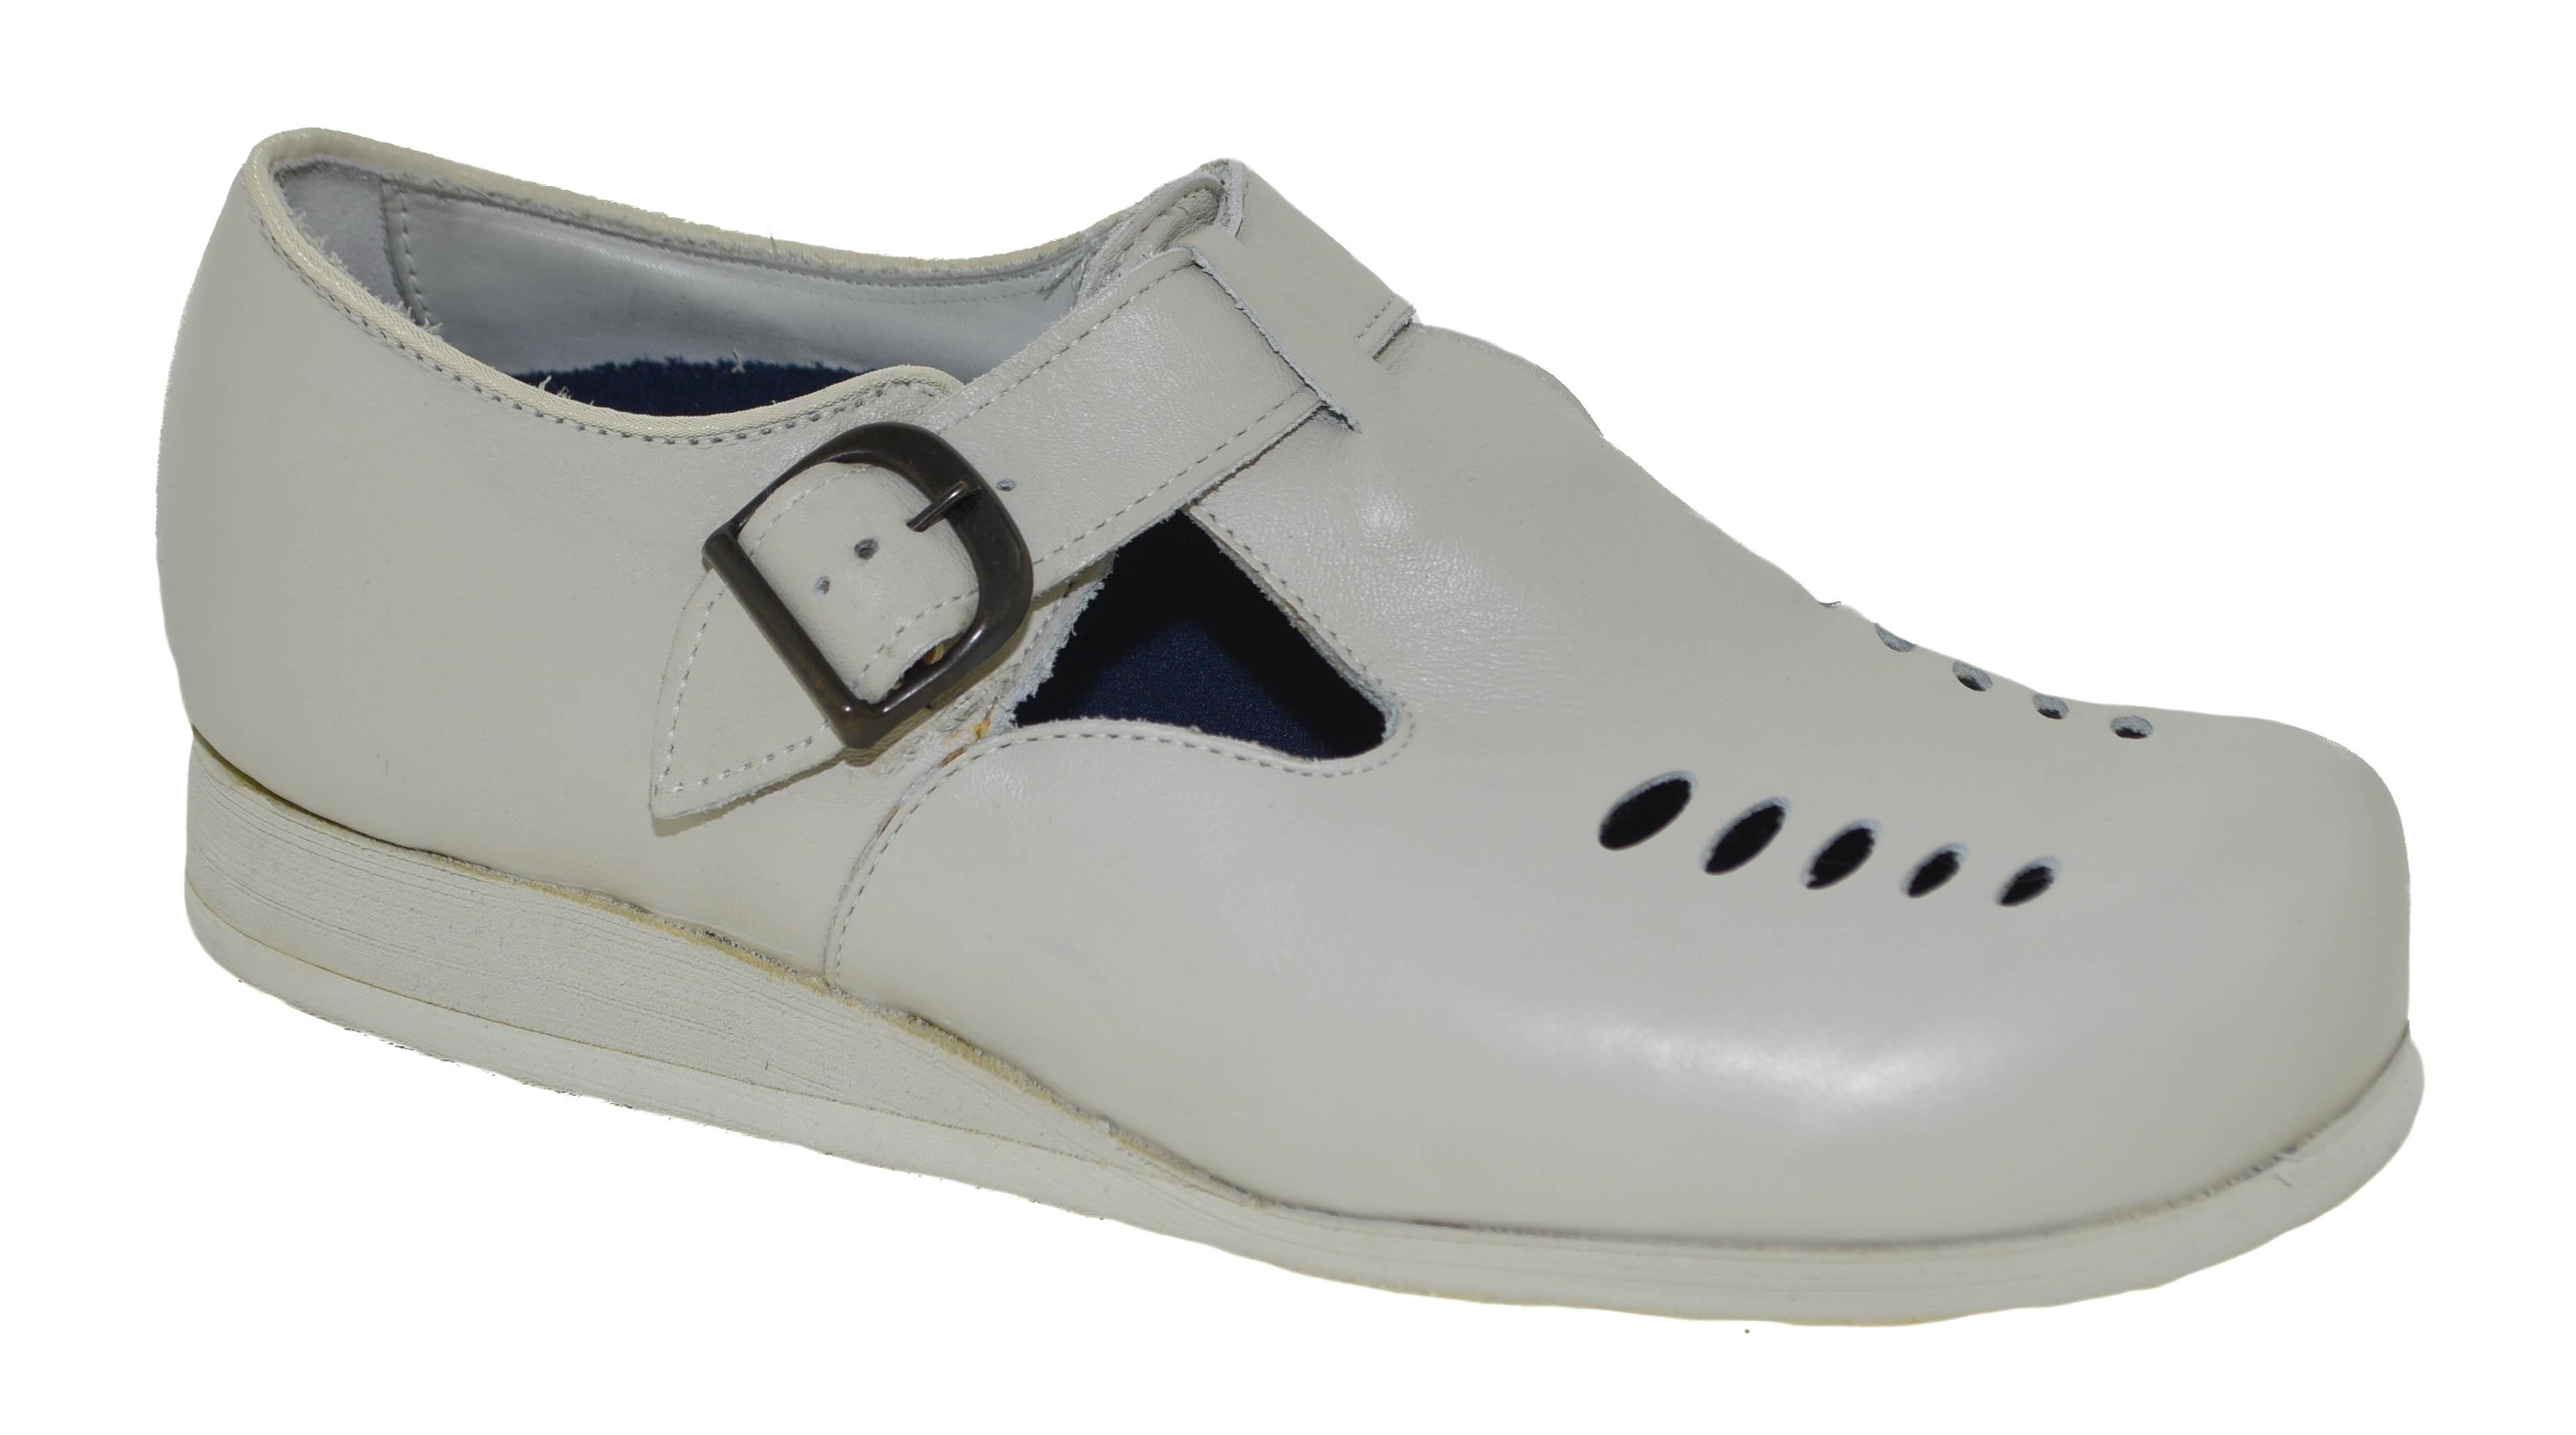 Clothing, Shoes & Accessories Comfort Shoes Pw Minor Bella Womens Jet Black Suede Diabetic Orthopedic Comfort Flats Shoes